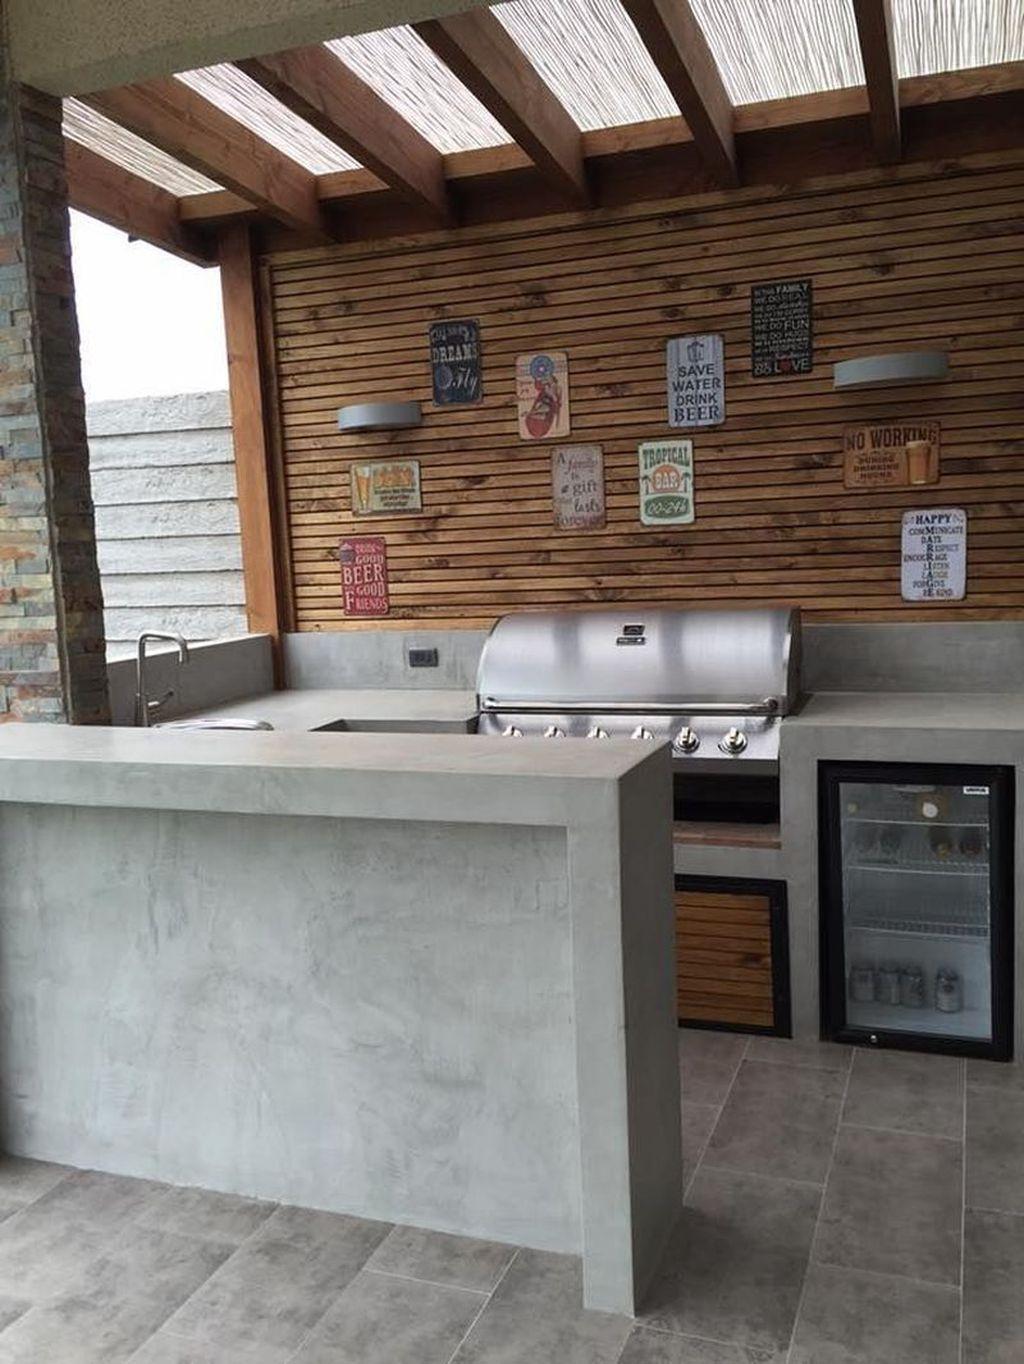 30 Newest Outdoor Kitchen Decoration Ideas To Make Cozy Kitchen Outdoor Kitchen Decor Diy Outdoor Kitchen Outdoor Kitchen Design